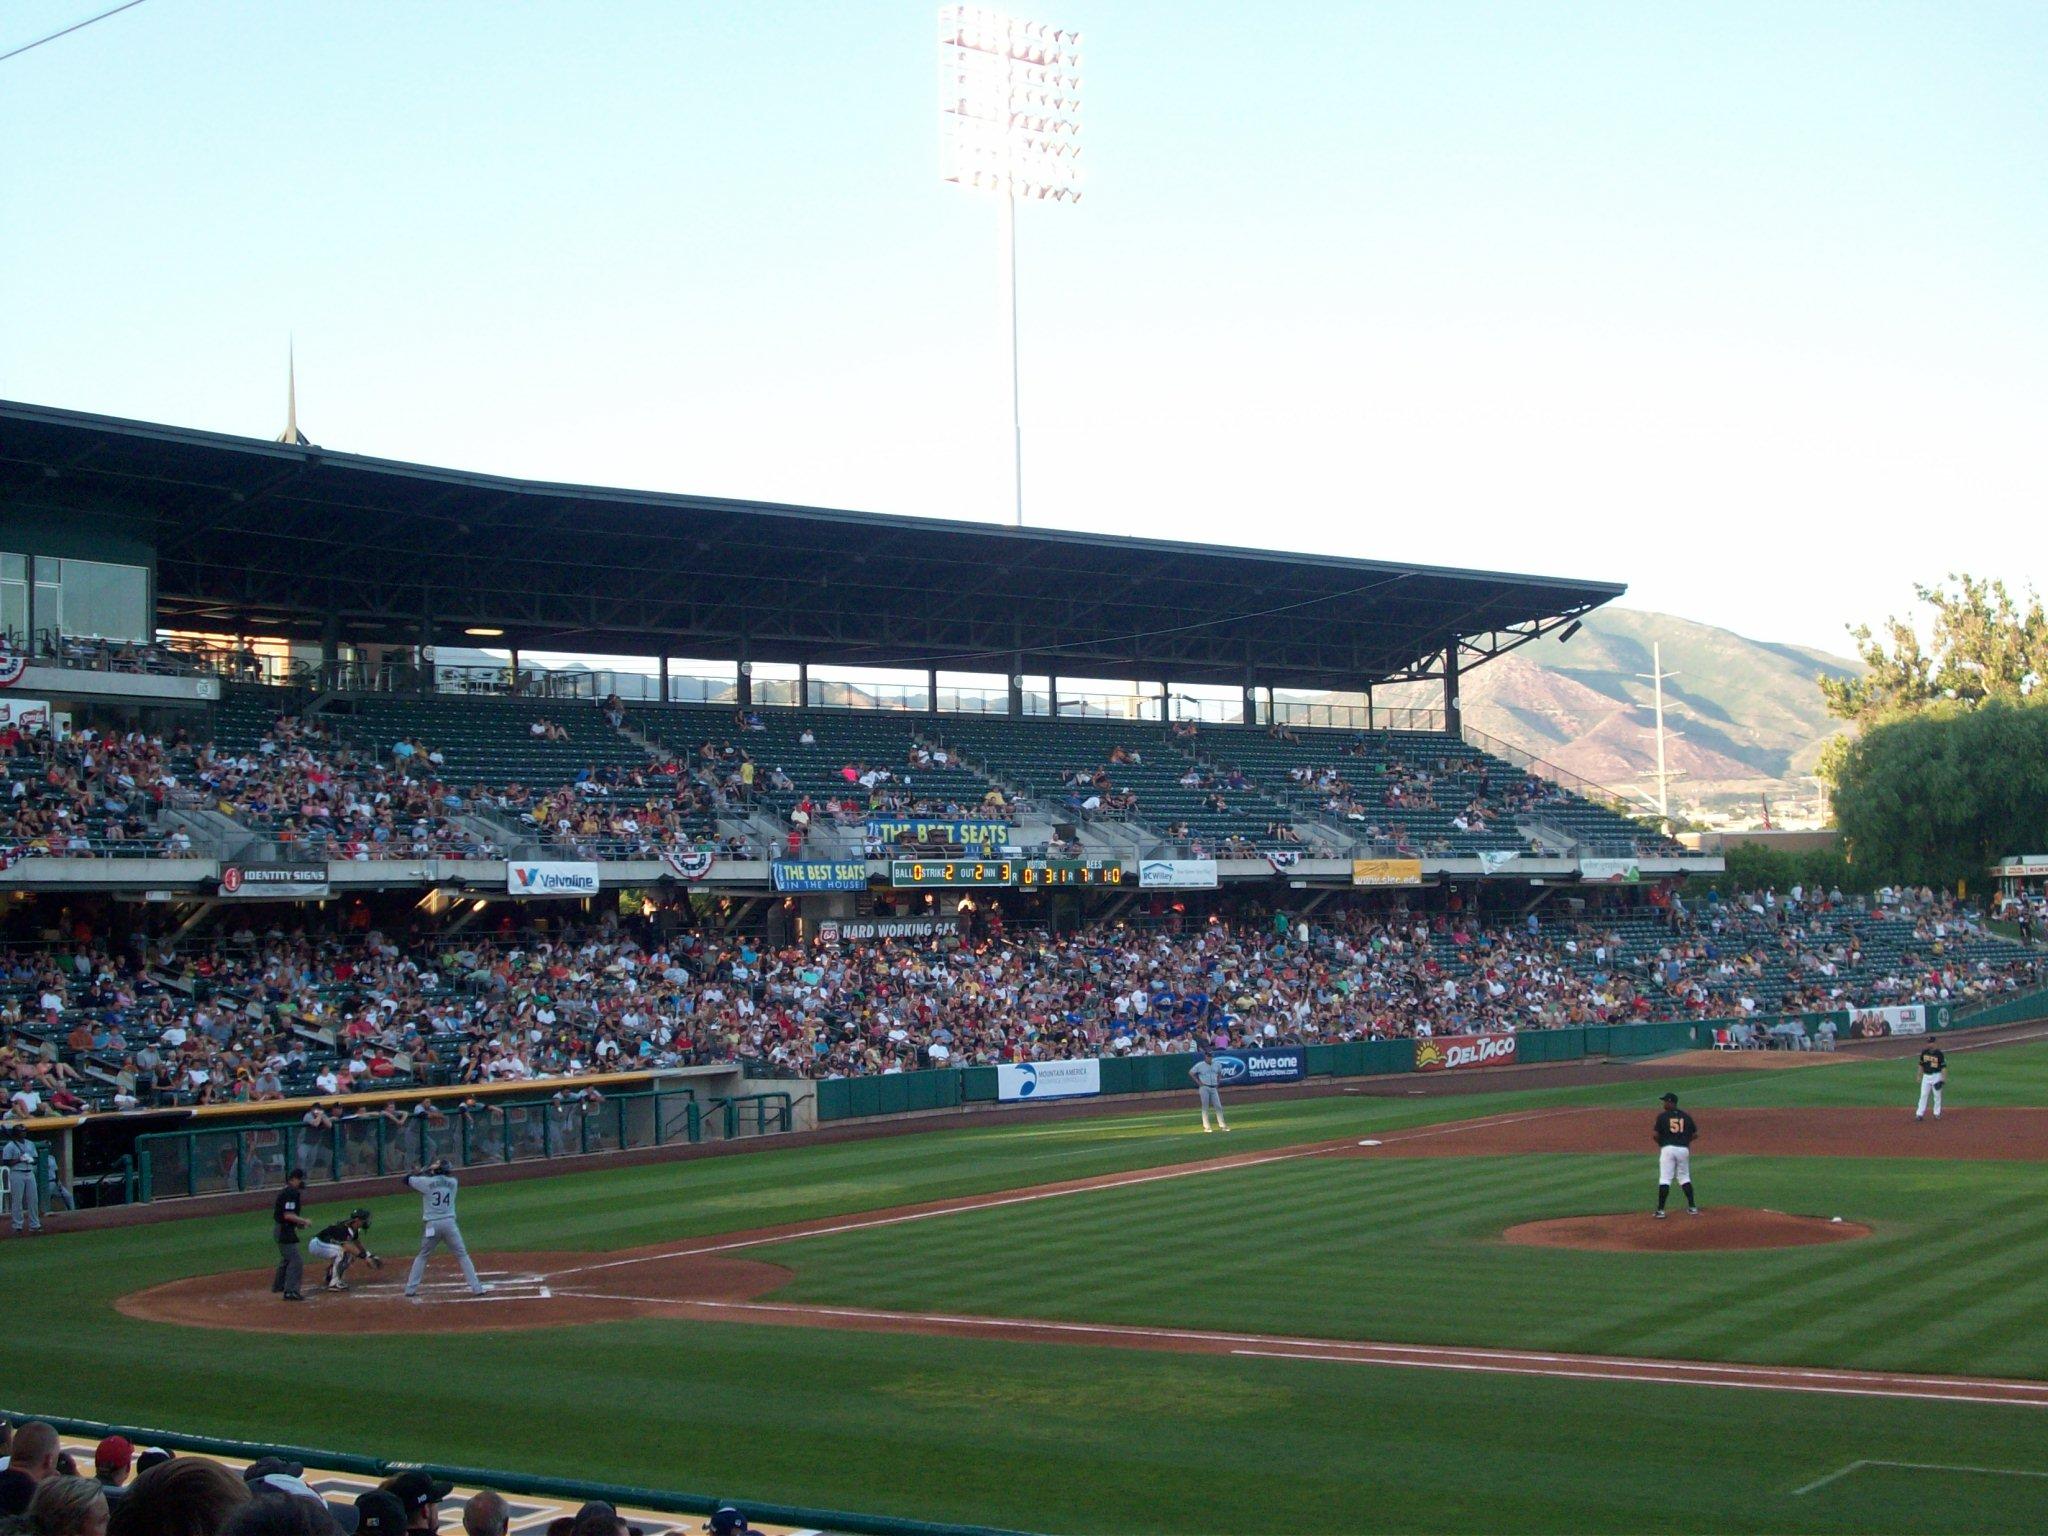 Smiths Park City >> Salt Lake City, UT (Smith's Ballpark and Squatters Pub) – Ballparks and Brews